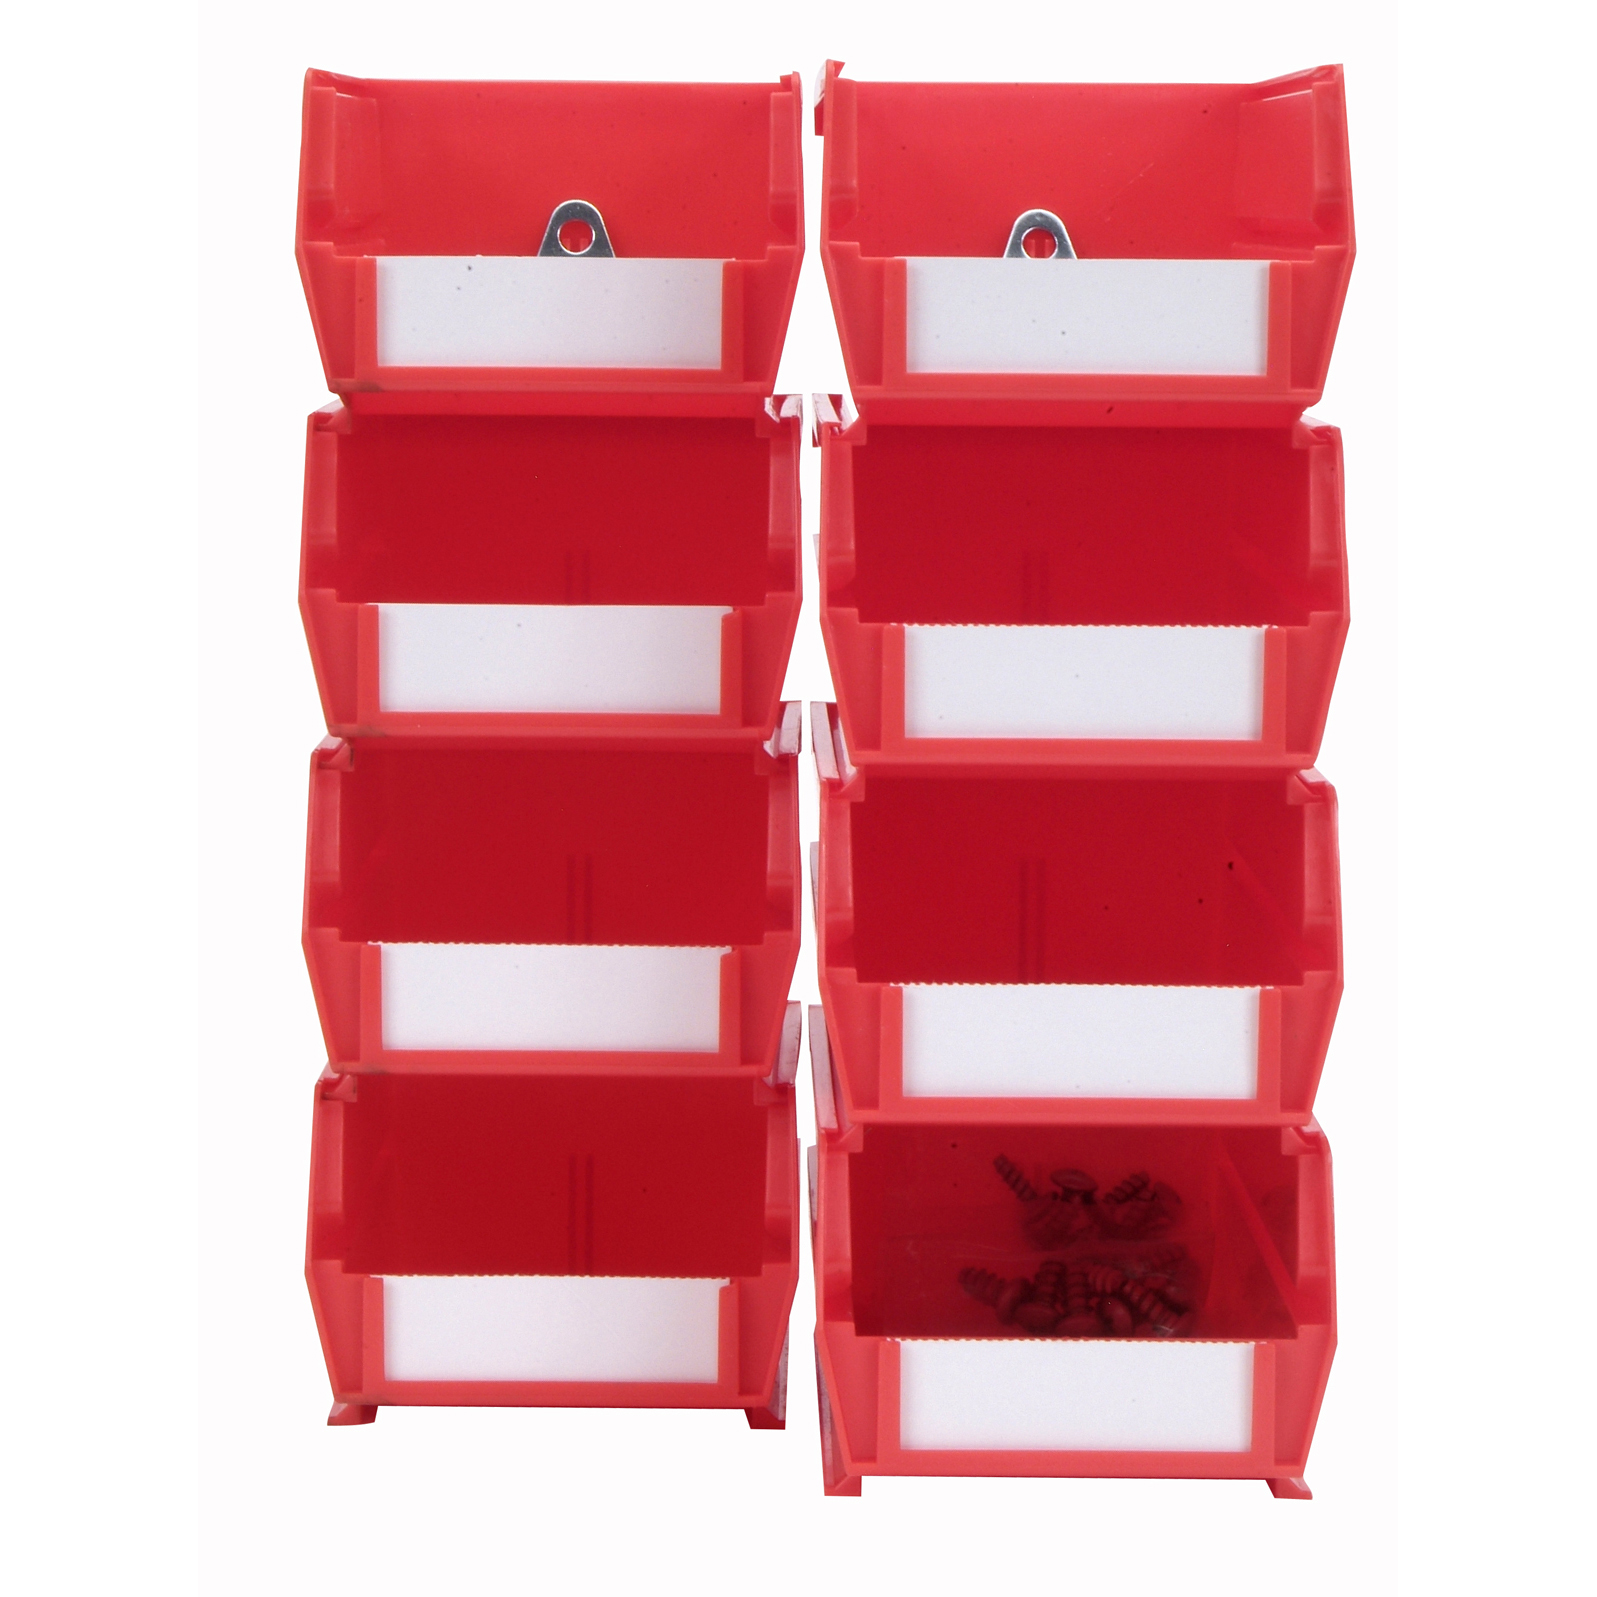 Red Hanging Bin & Clip Kits